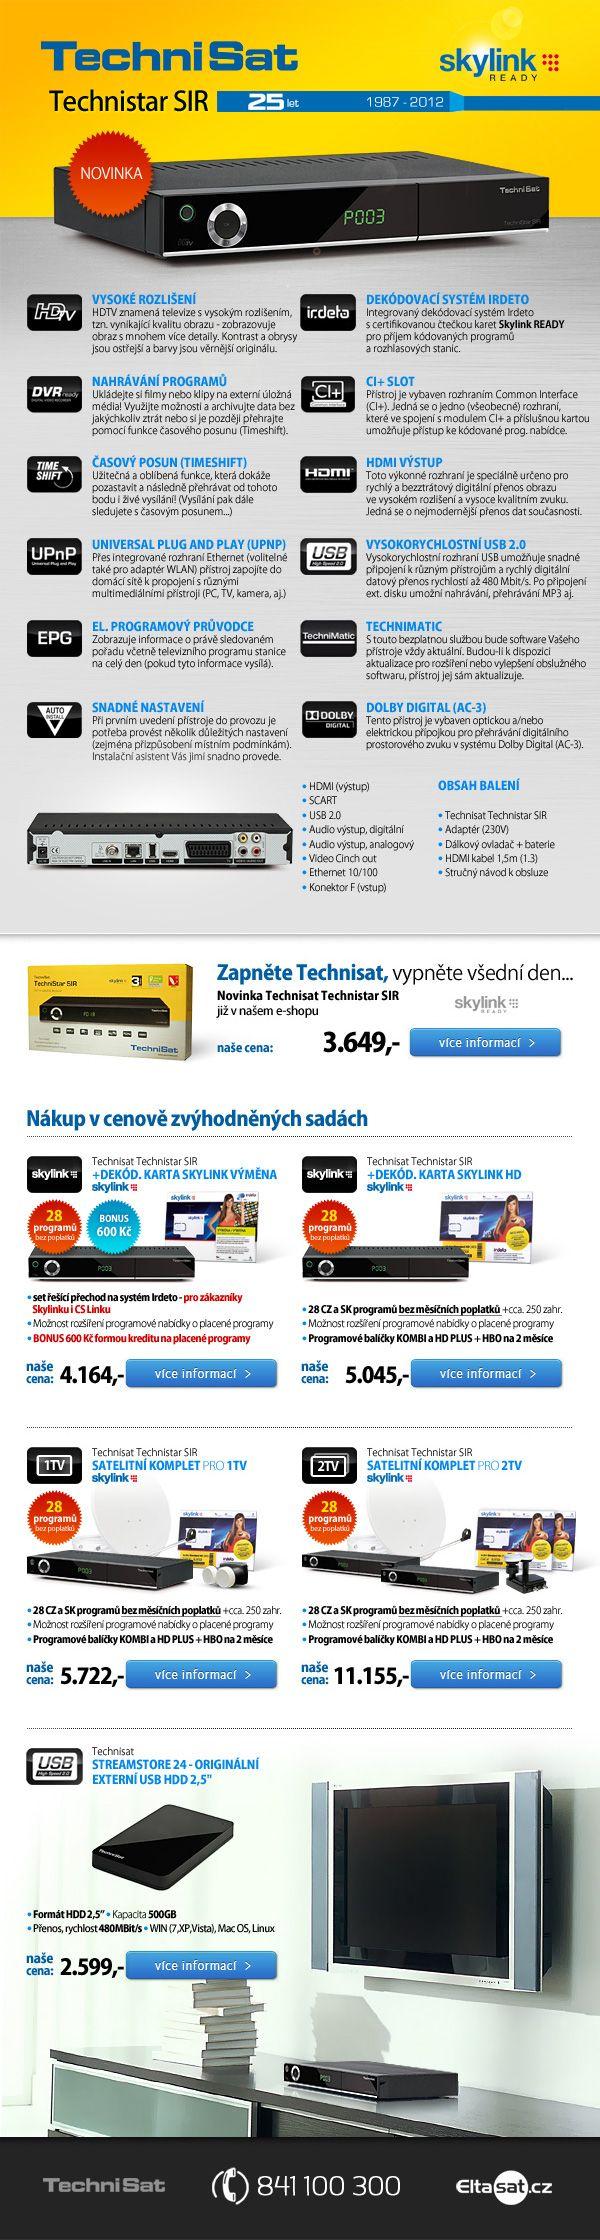 Satelitní přijímač Technisat technistar SIR newsletter - Eltasat